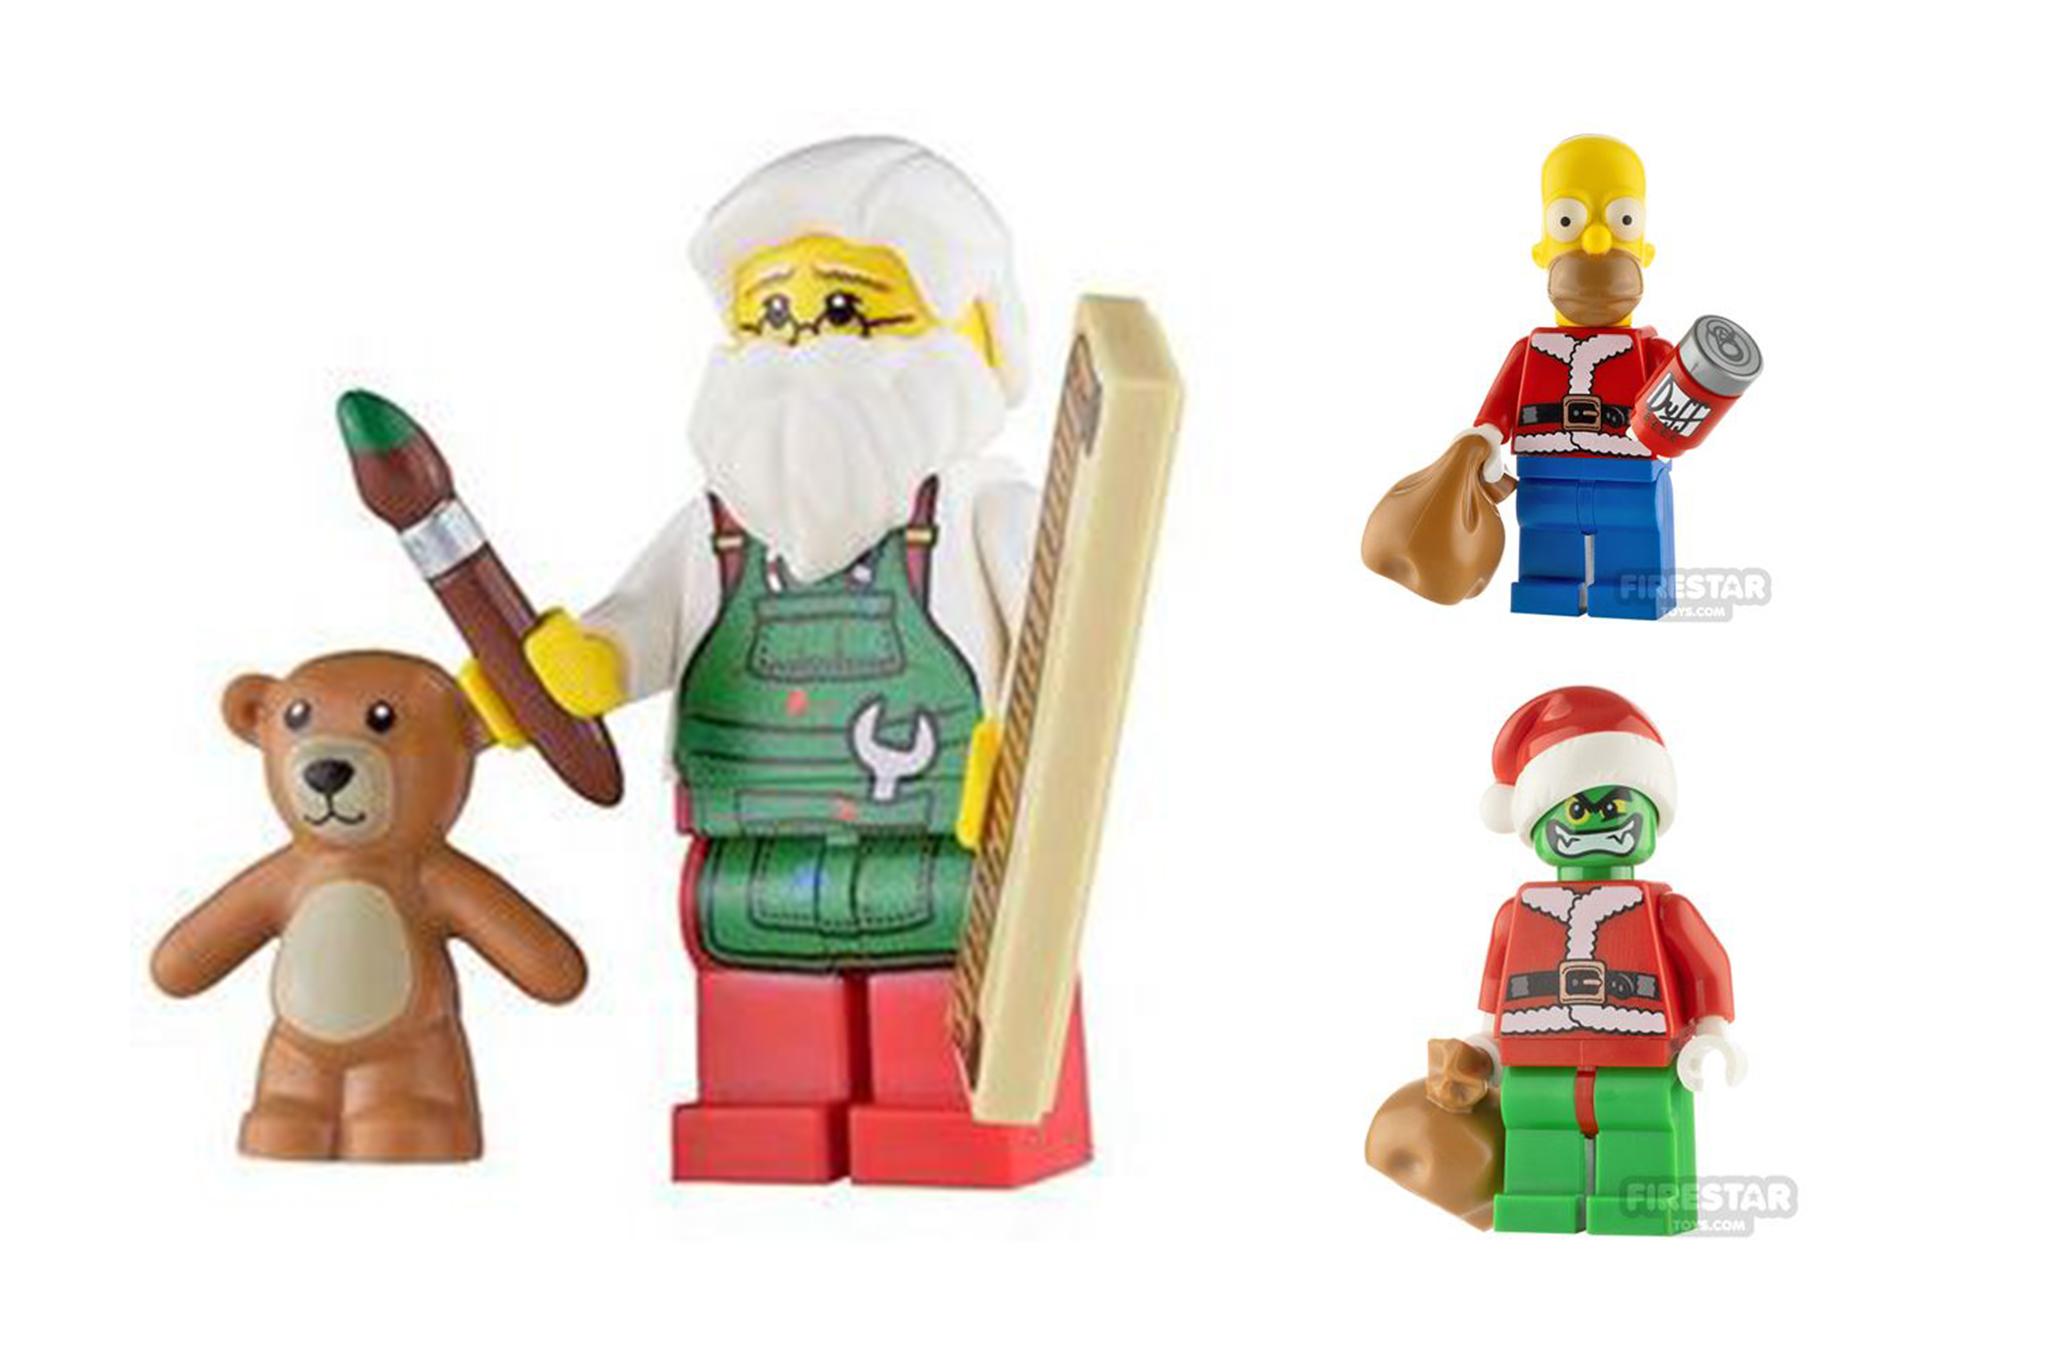 LEGO Custom Minifigure of Santa, Homer and Grinch